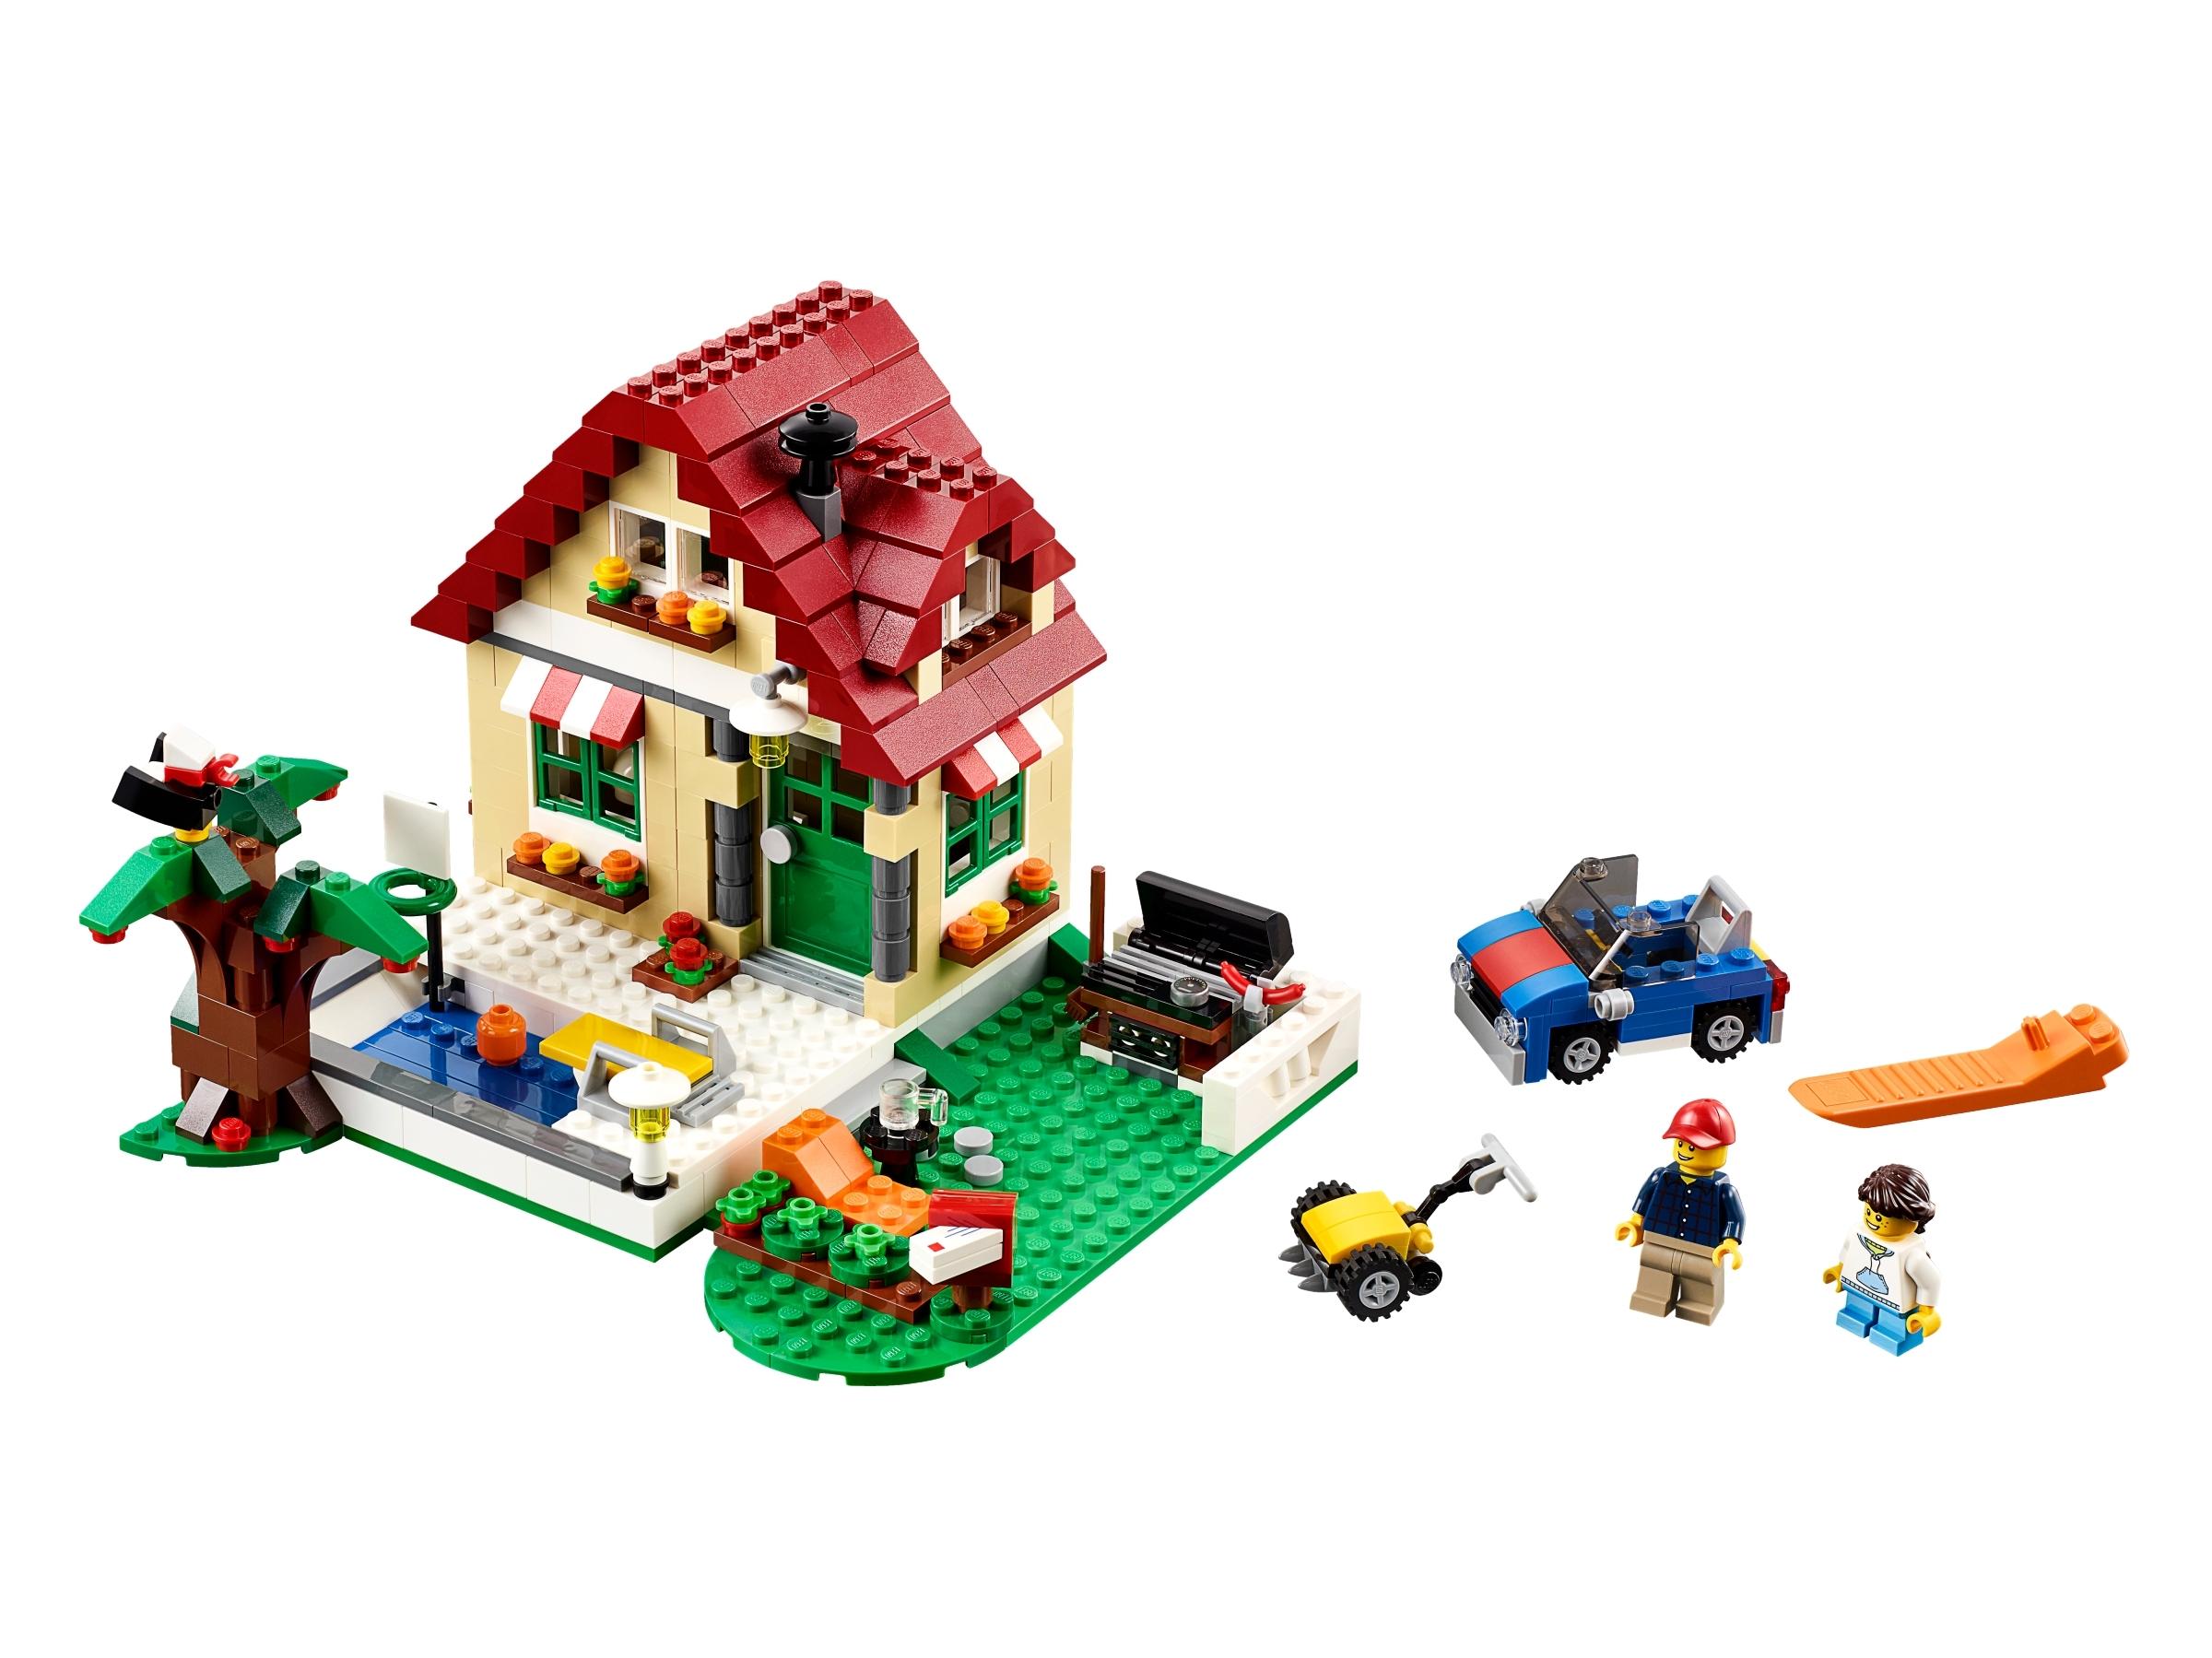 lego verandering van de seizoenen 31038